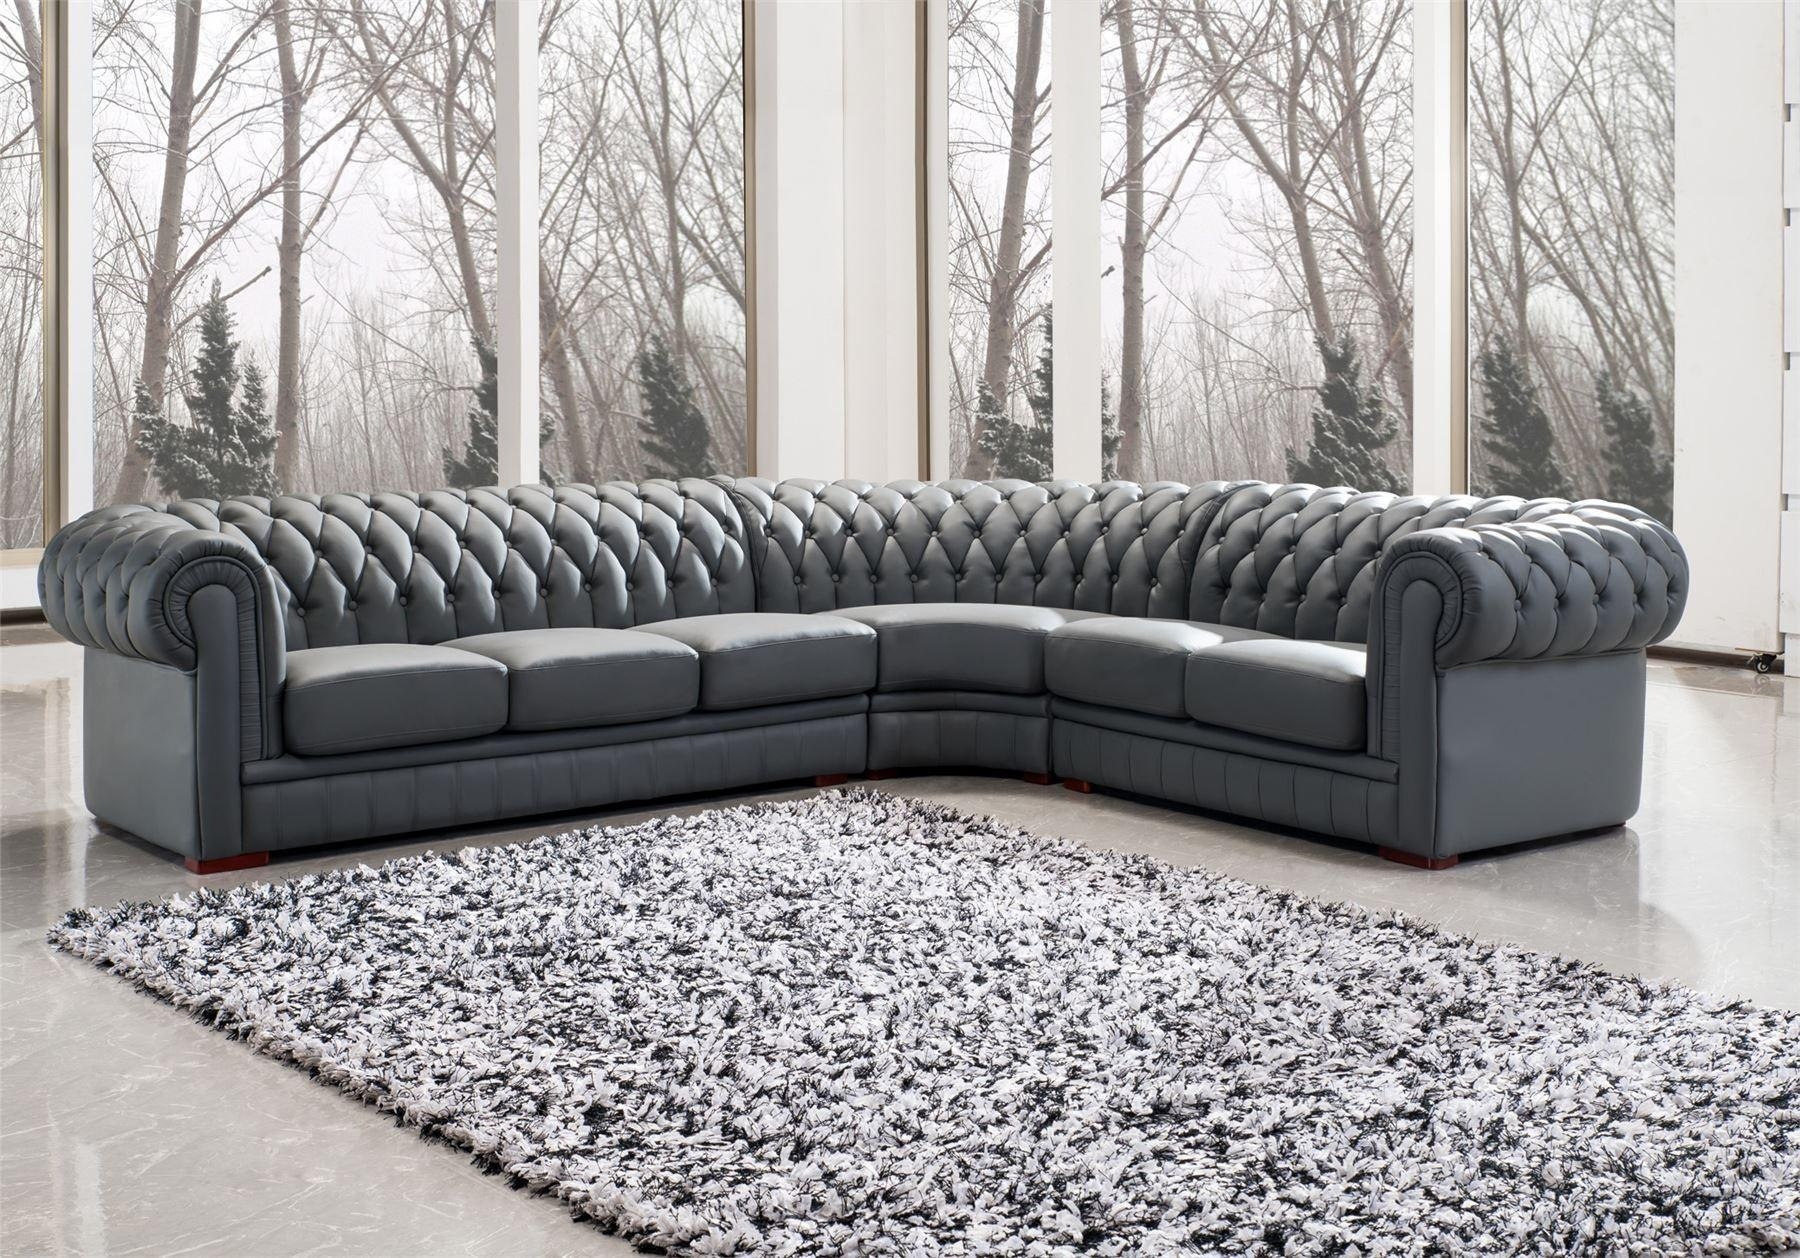 ▻ Sofa : 27 Wonderful Chesterfield Tufted Sofa Chesterfield Sofa In Tufted Leather Chesterfield Sofas (Image 1 of 20)